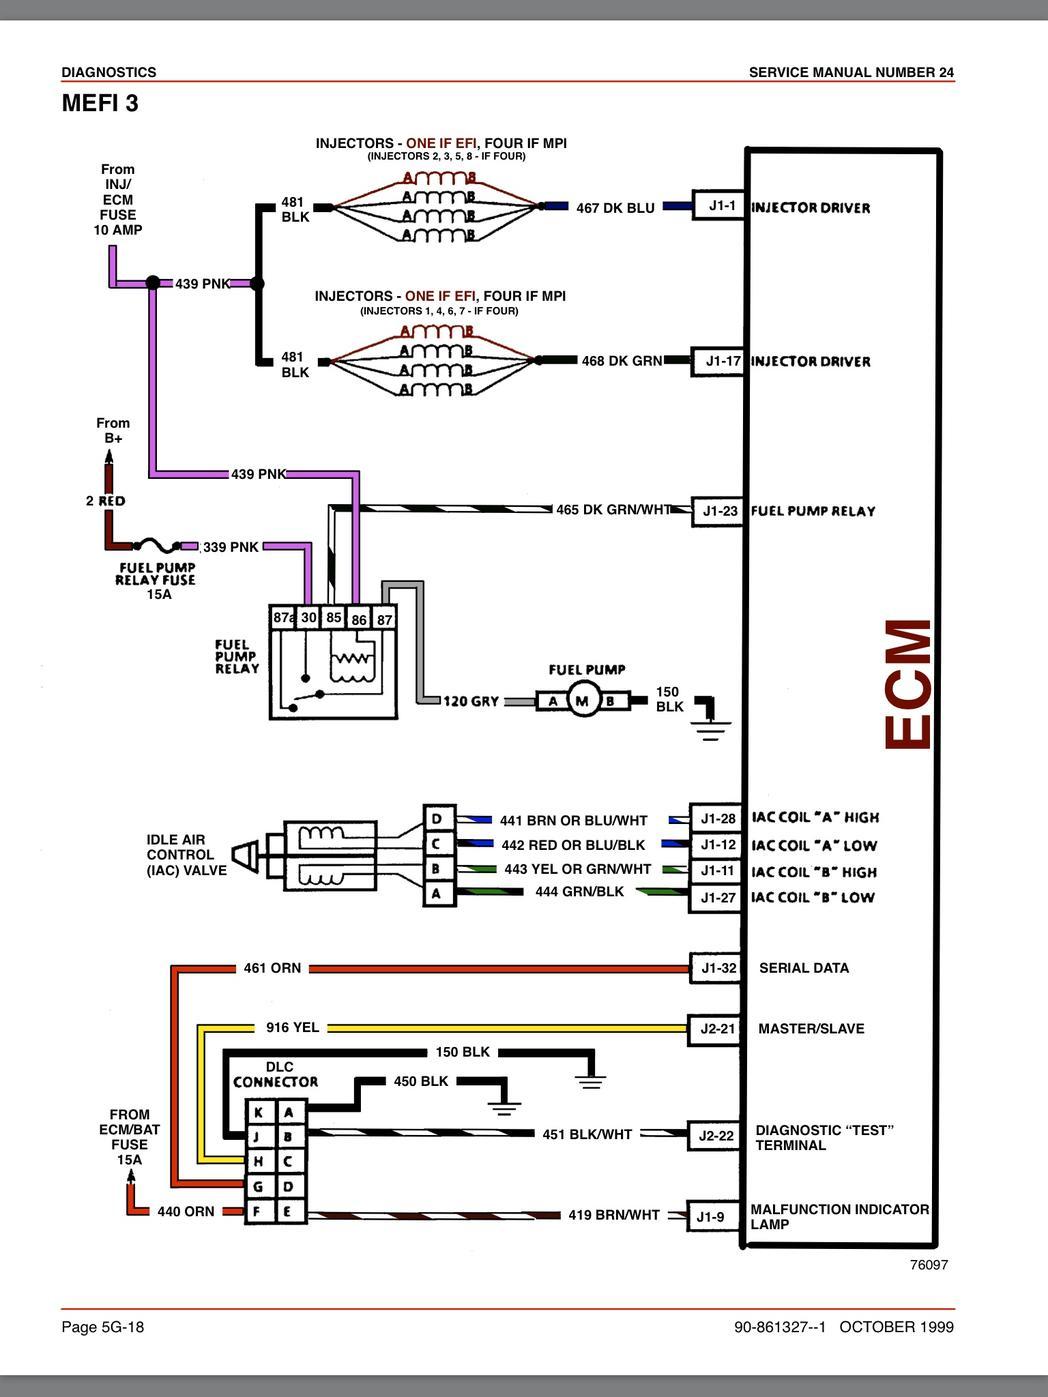 AB_7483] Vortec 350 Wiring Diagram Free Diagram | Vortec Wiring Diagram |  | Nedly Phil Trua Inrebe Abole Ixtu Bemua Dupl Sheox Plan Vira Mohammedshrine  Librar Wiring 101